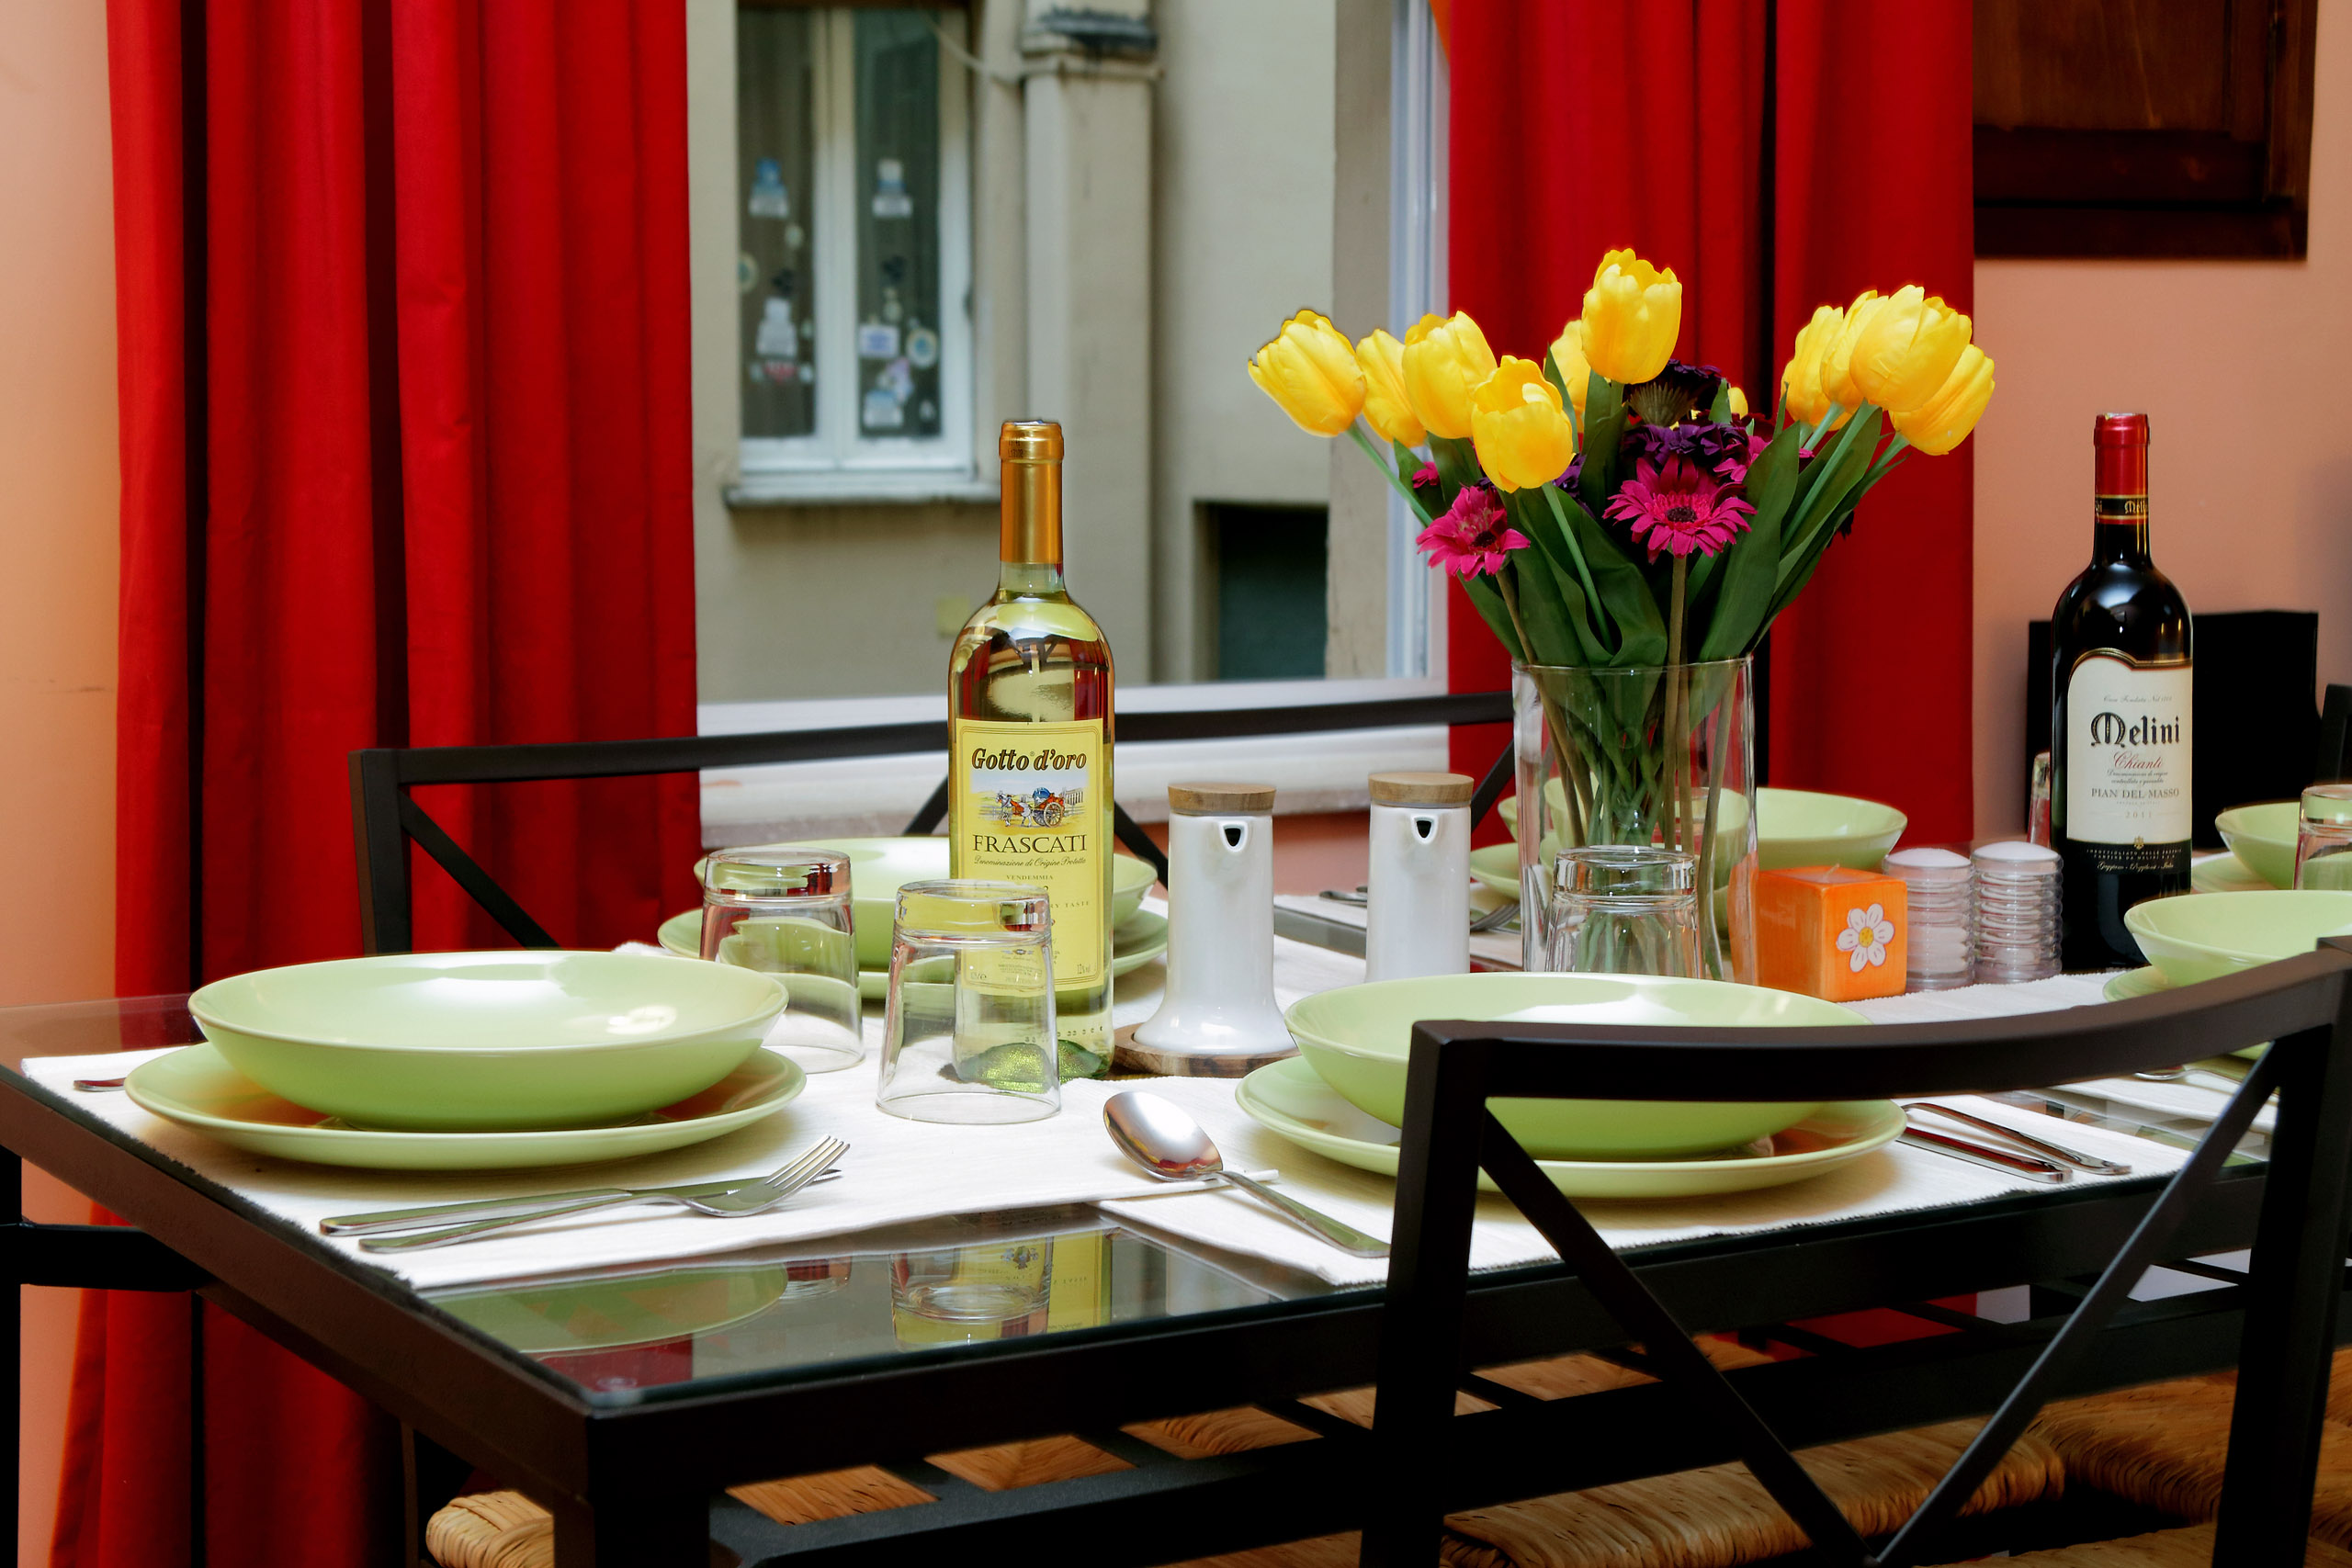 www.lillihouse.com - Lillihouse | Via Cincinnato 9, 00175 Roma (IT) | info@lillihouse.com - Gallery - immagine 08